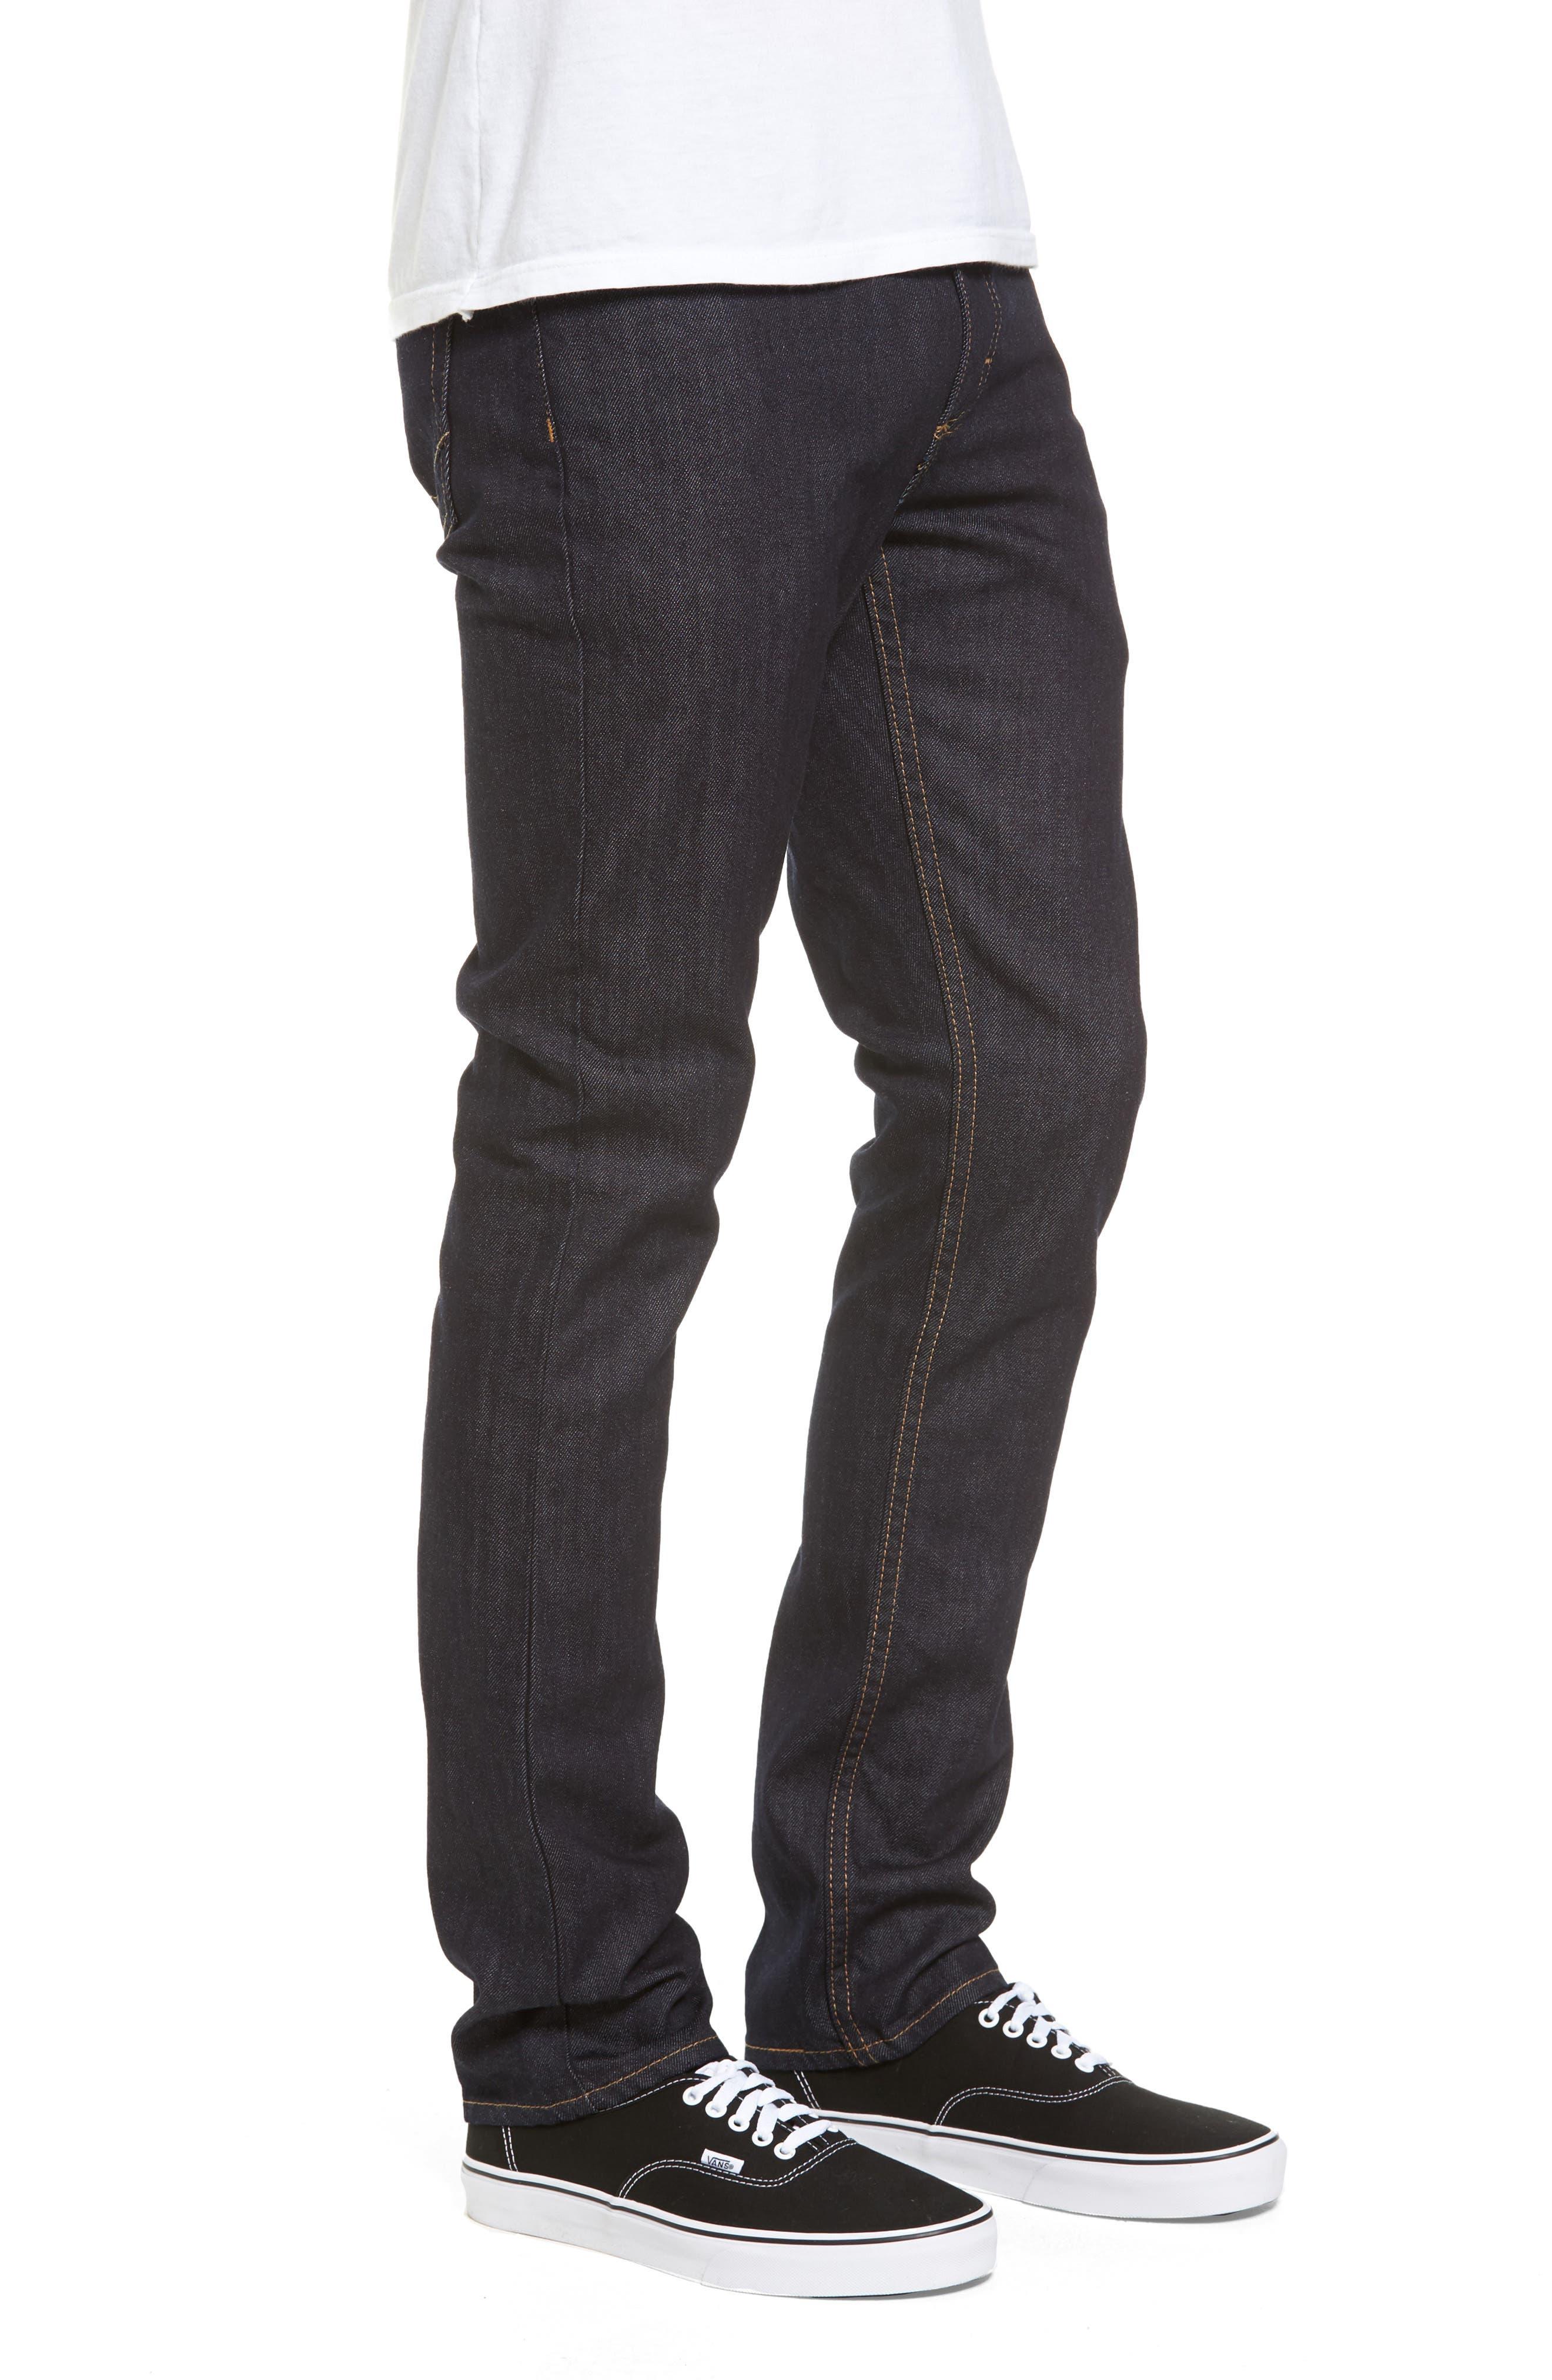 V76 Skinny Jeans,                             Alternate thumbnail 3, color,                             Indigo